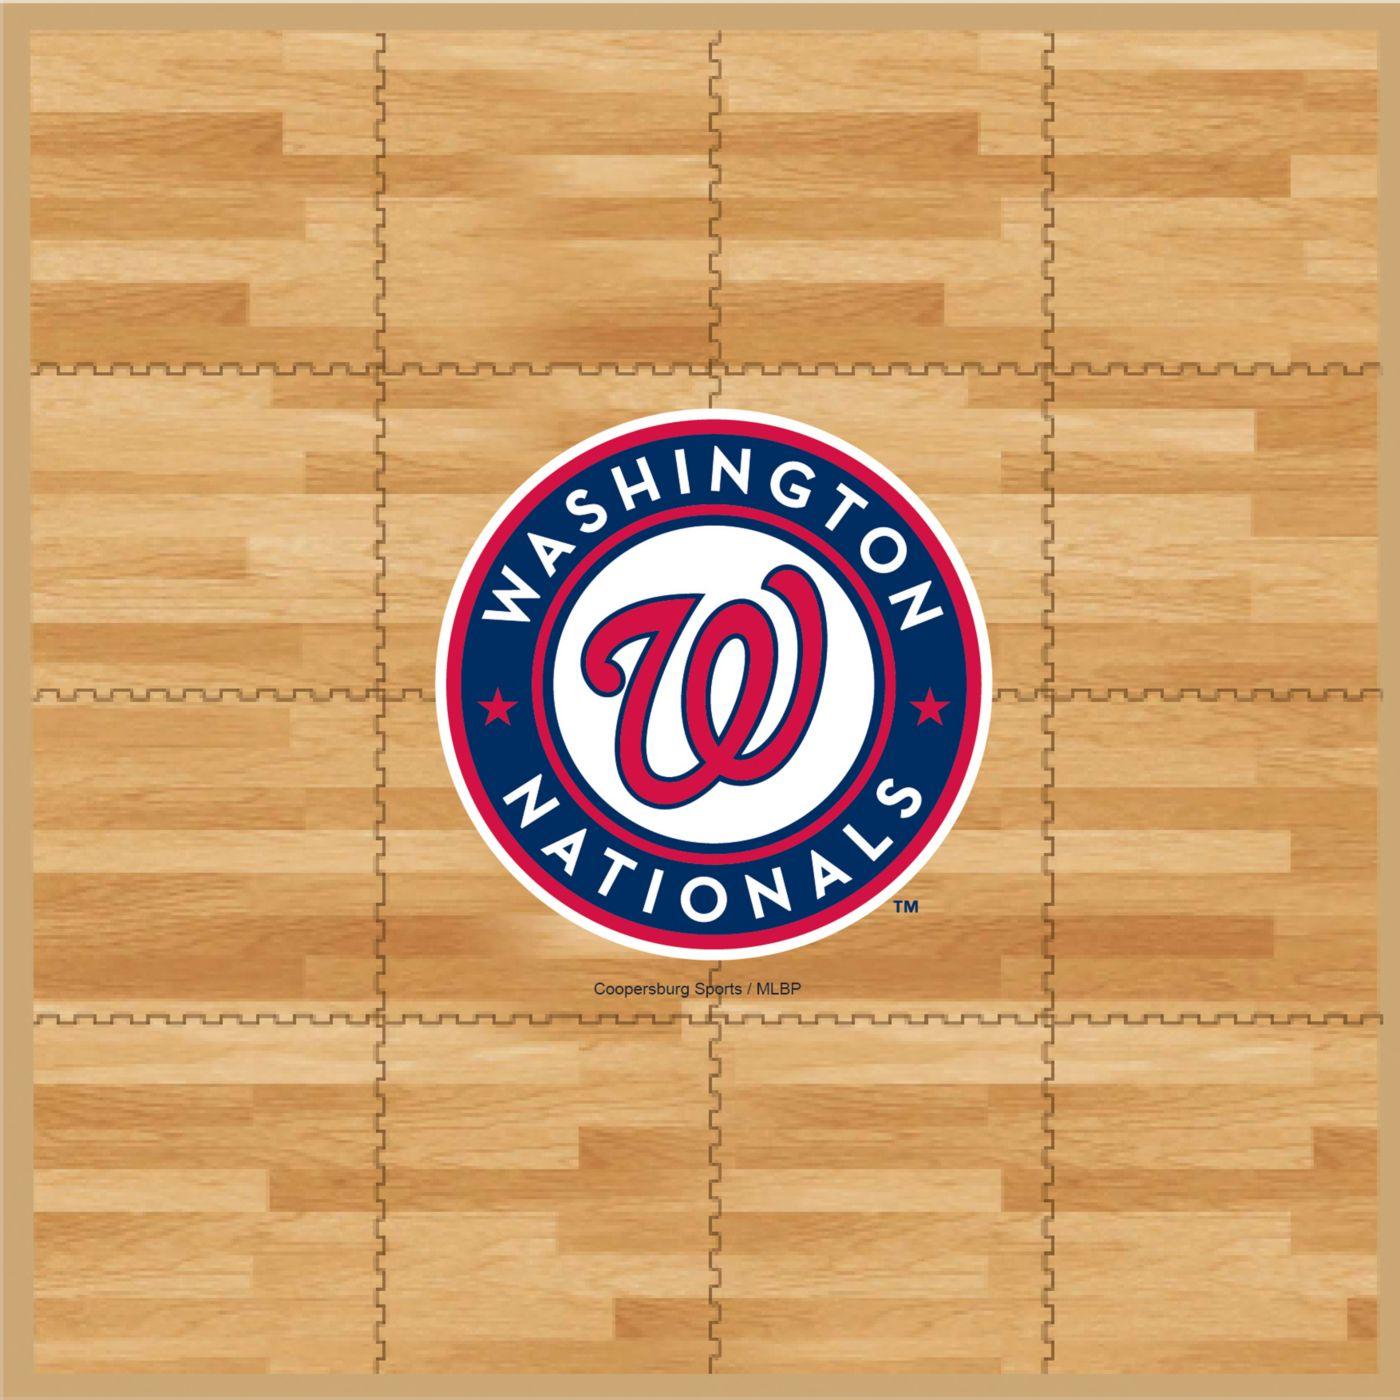 Coopersburg Sports Washington Nationals Fan Floor